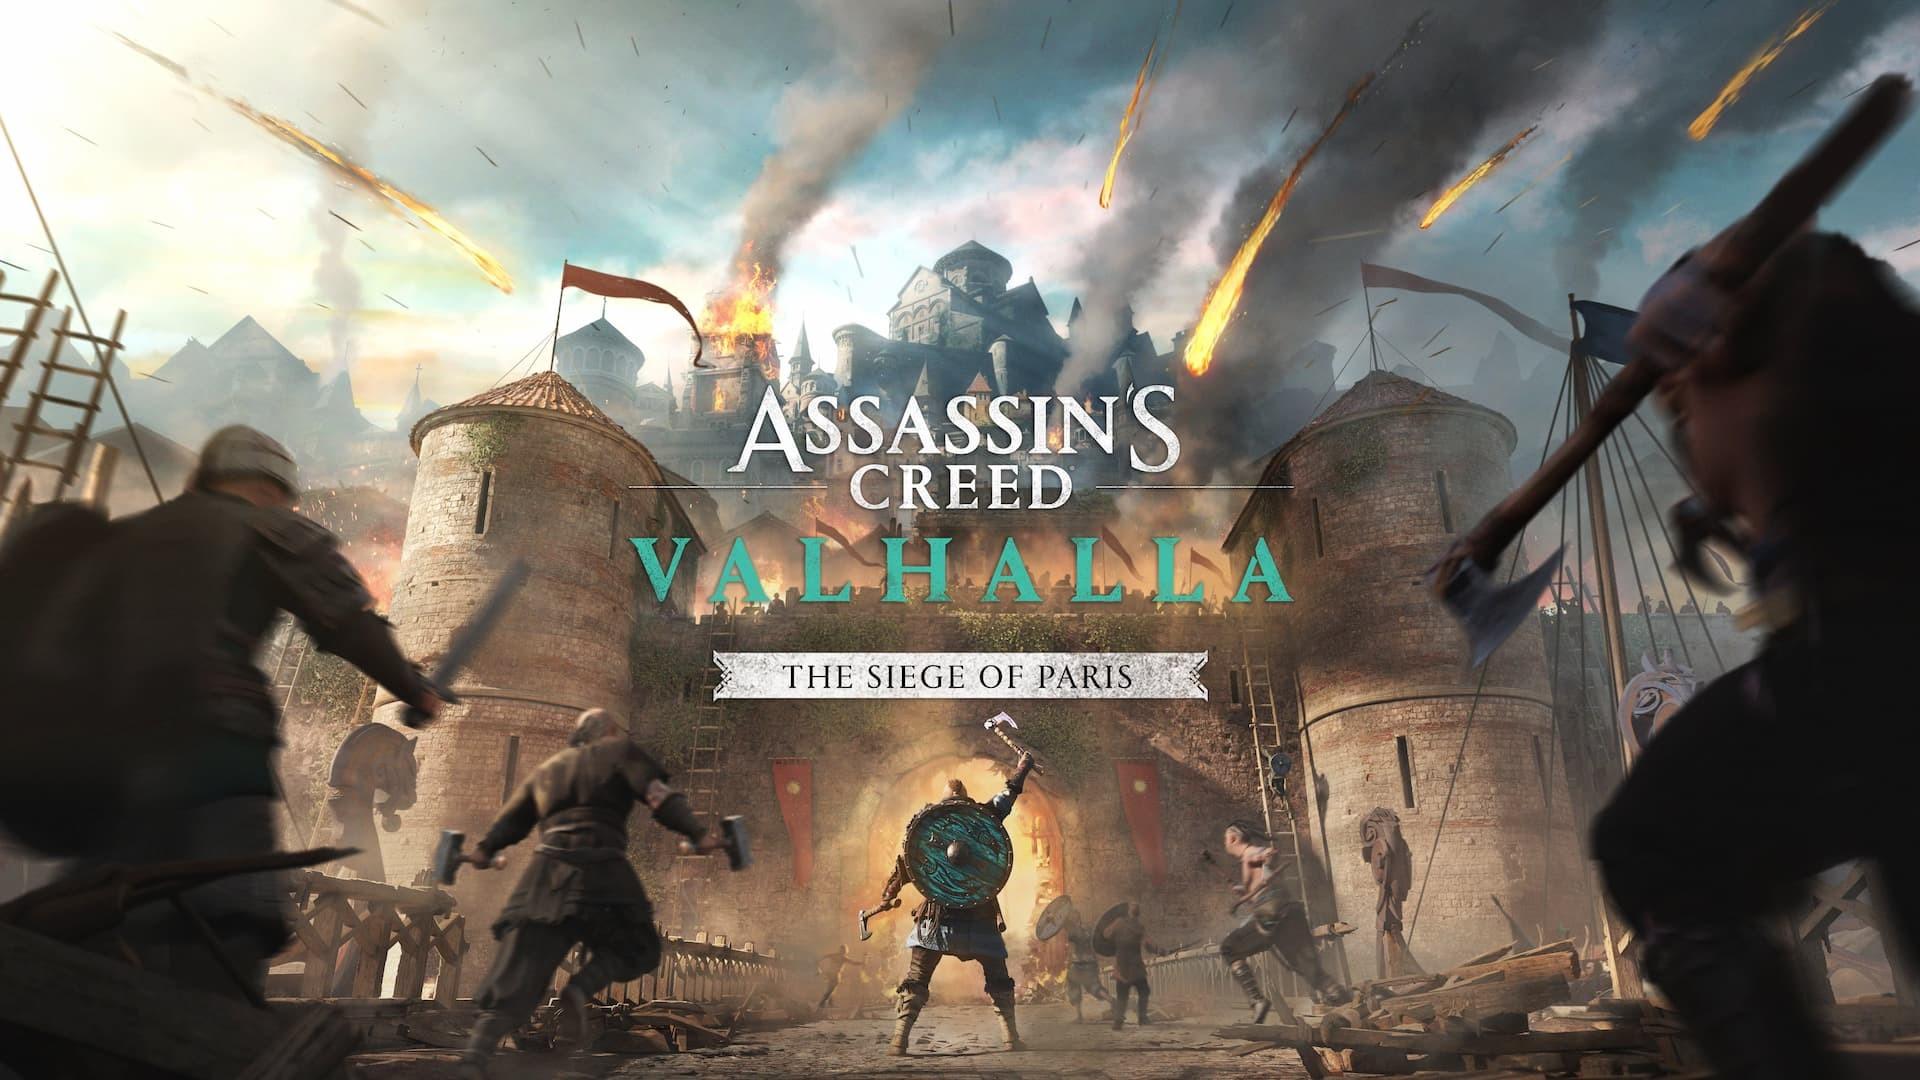 Assassin's Creed Valhalla L'assedio di Parigi copertina artwork